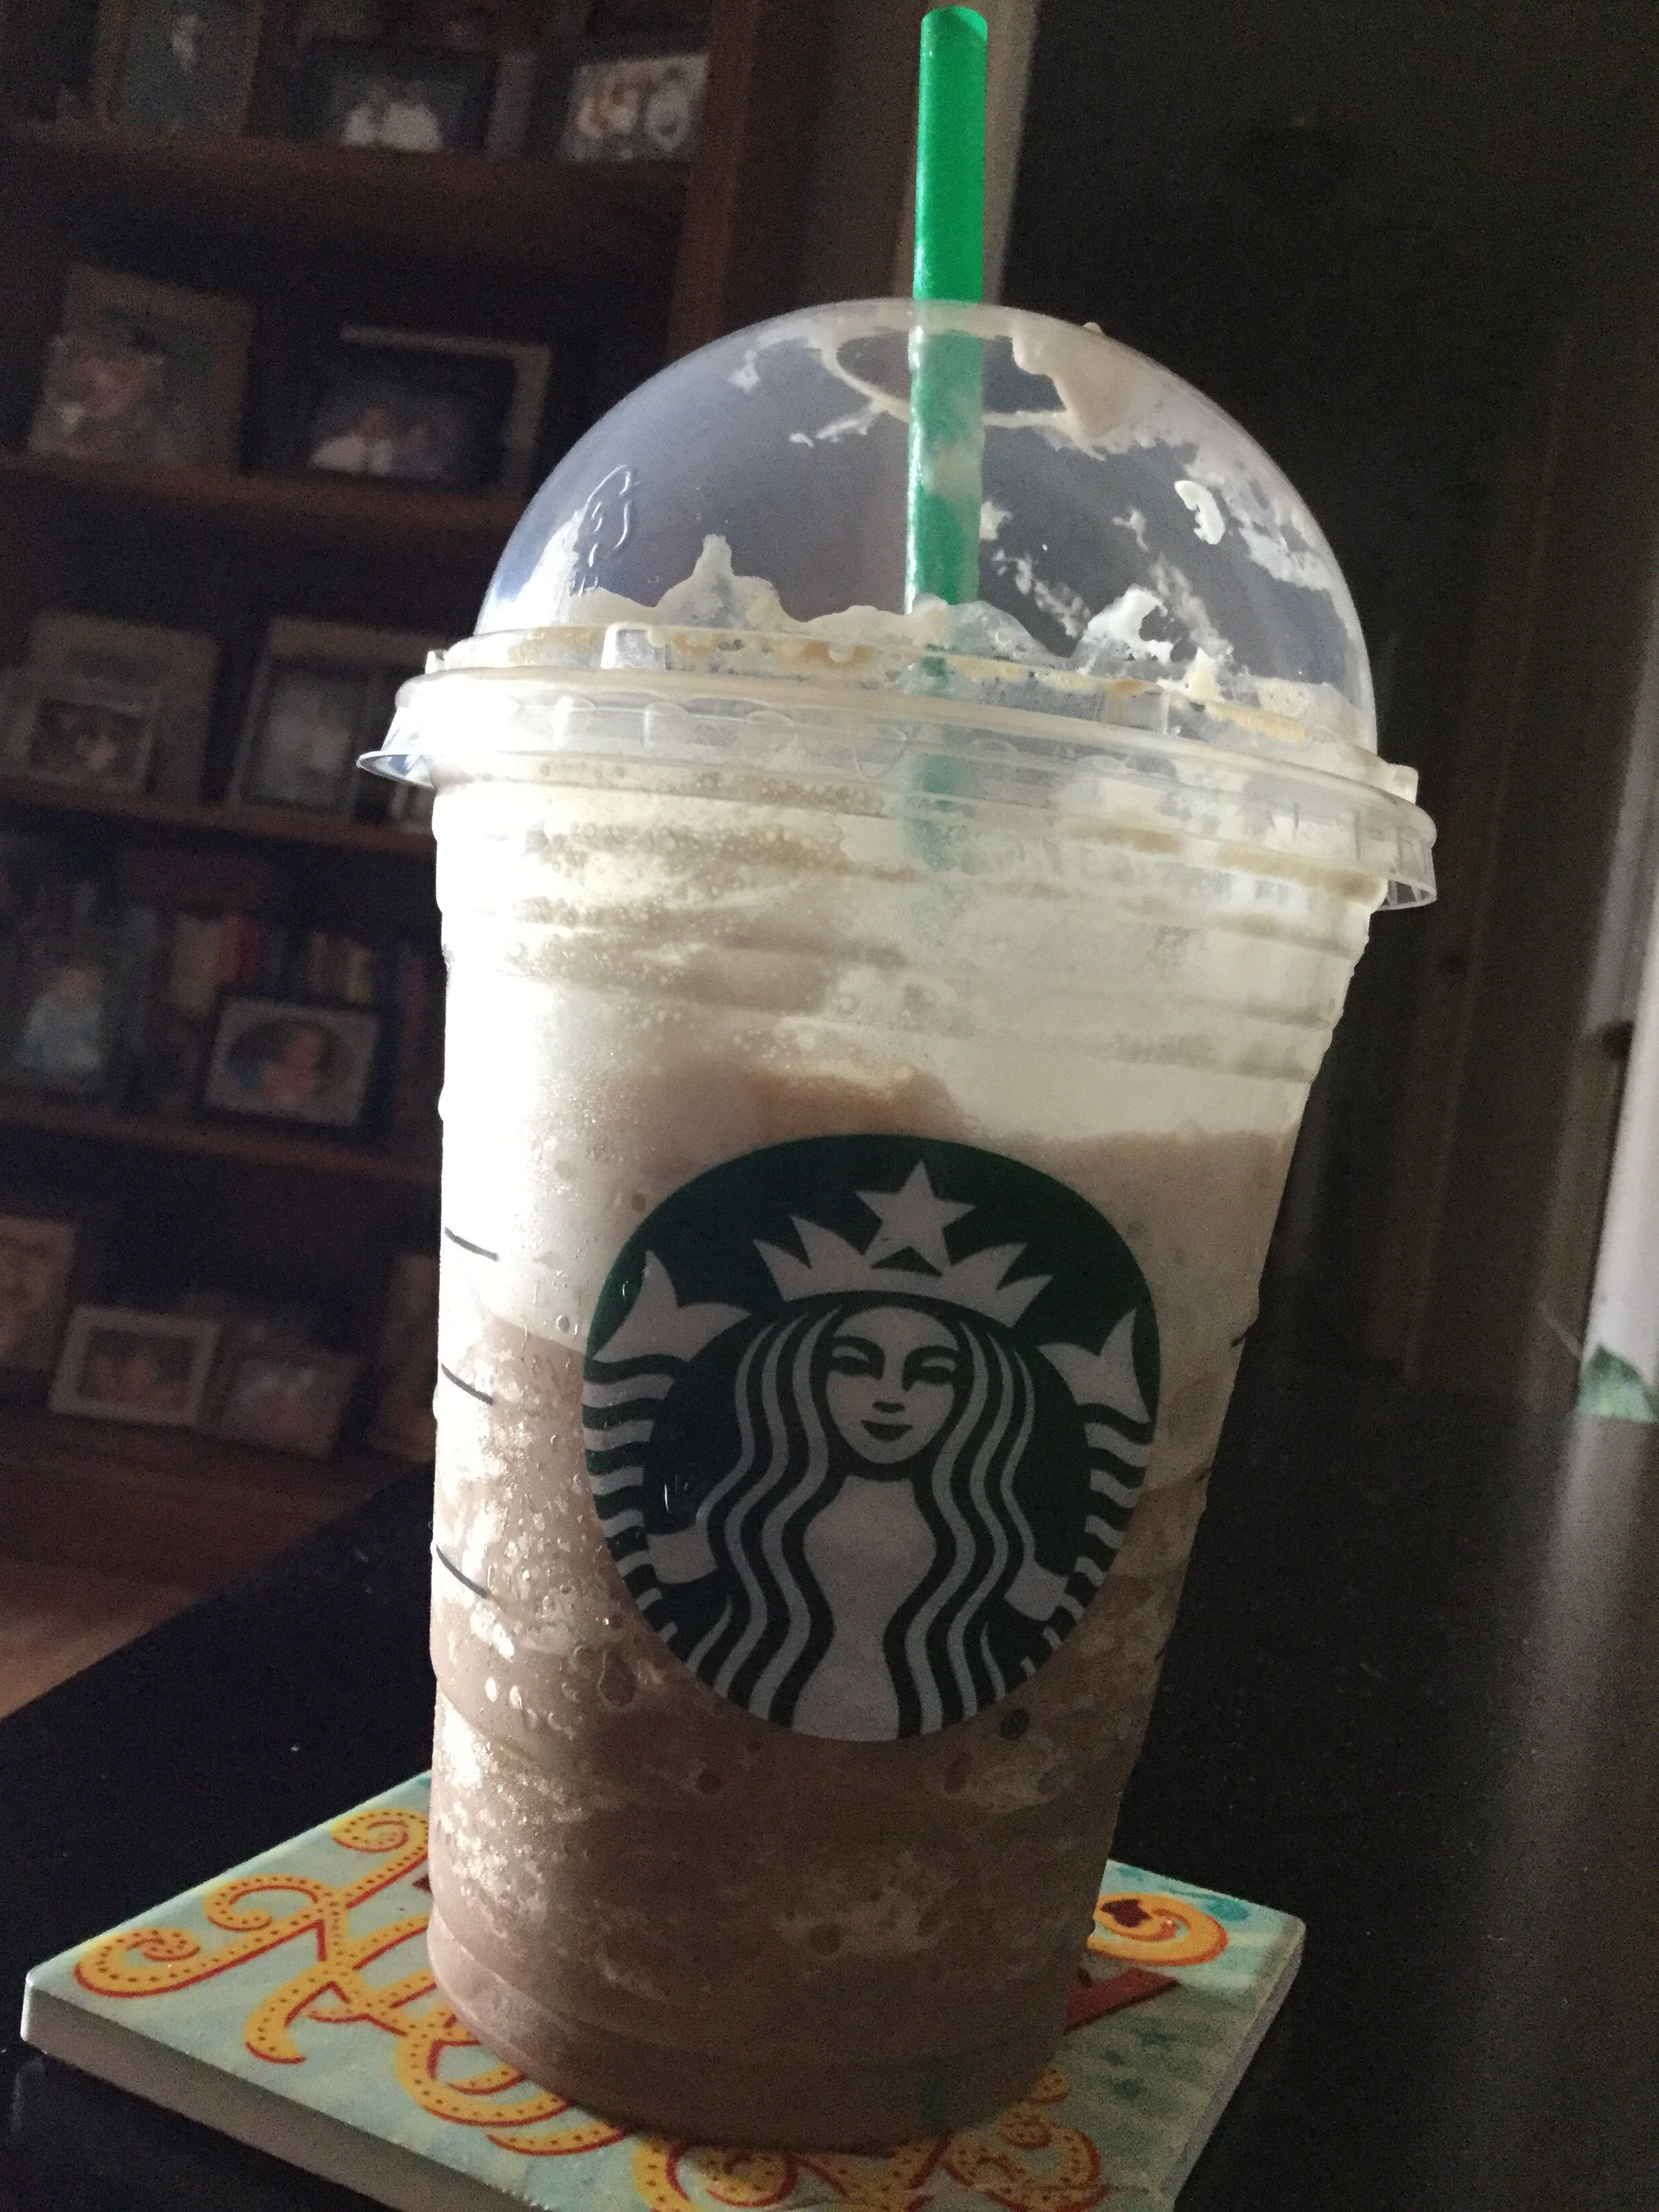 A mocha frappuccino from starbucks starbucks mocha